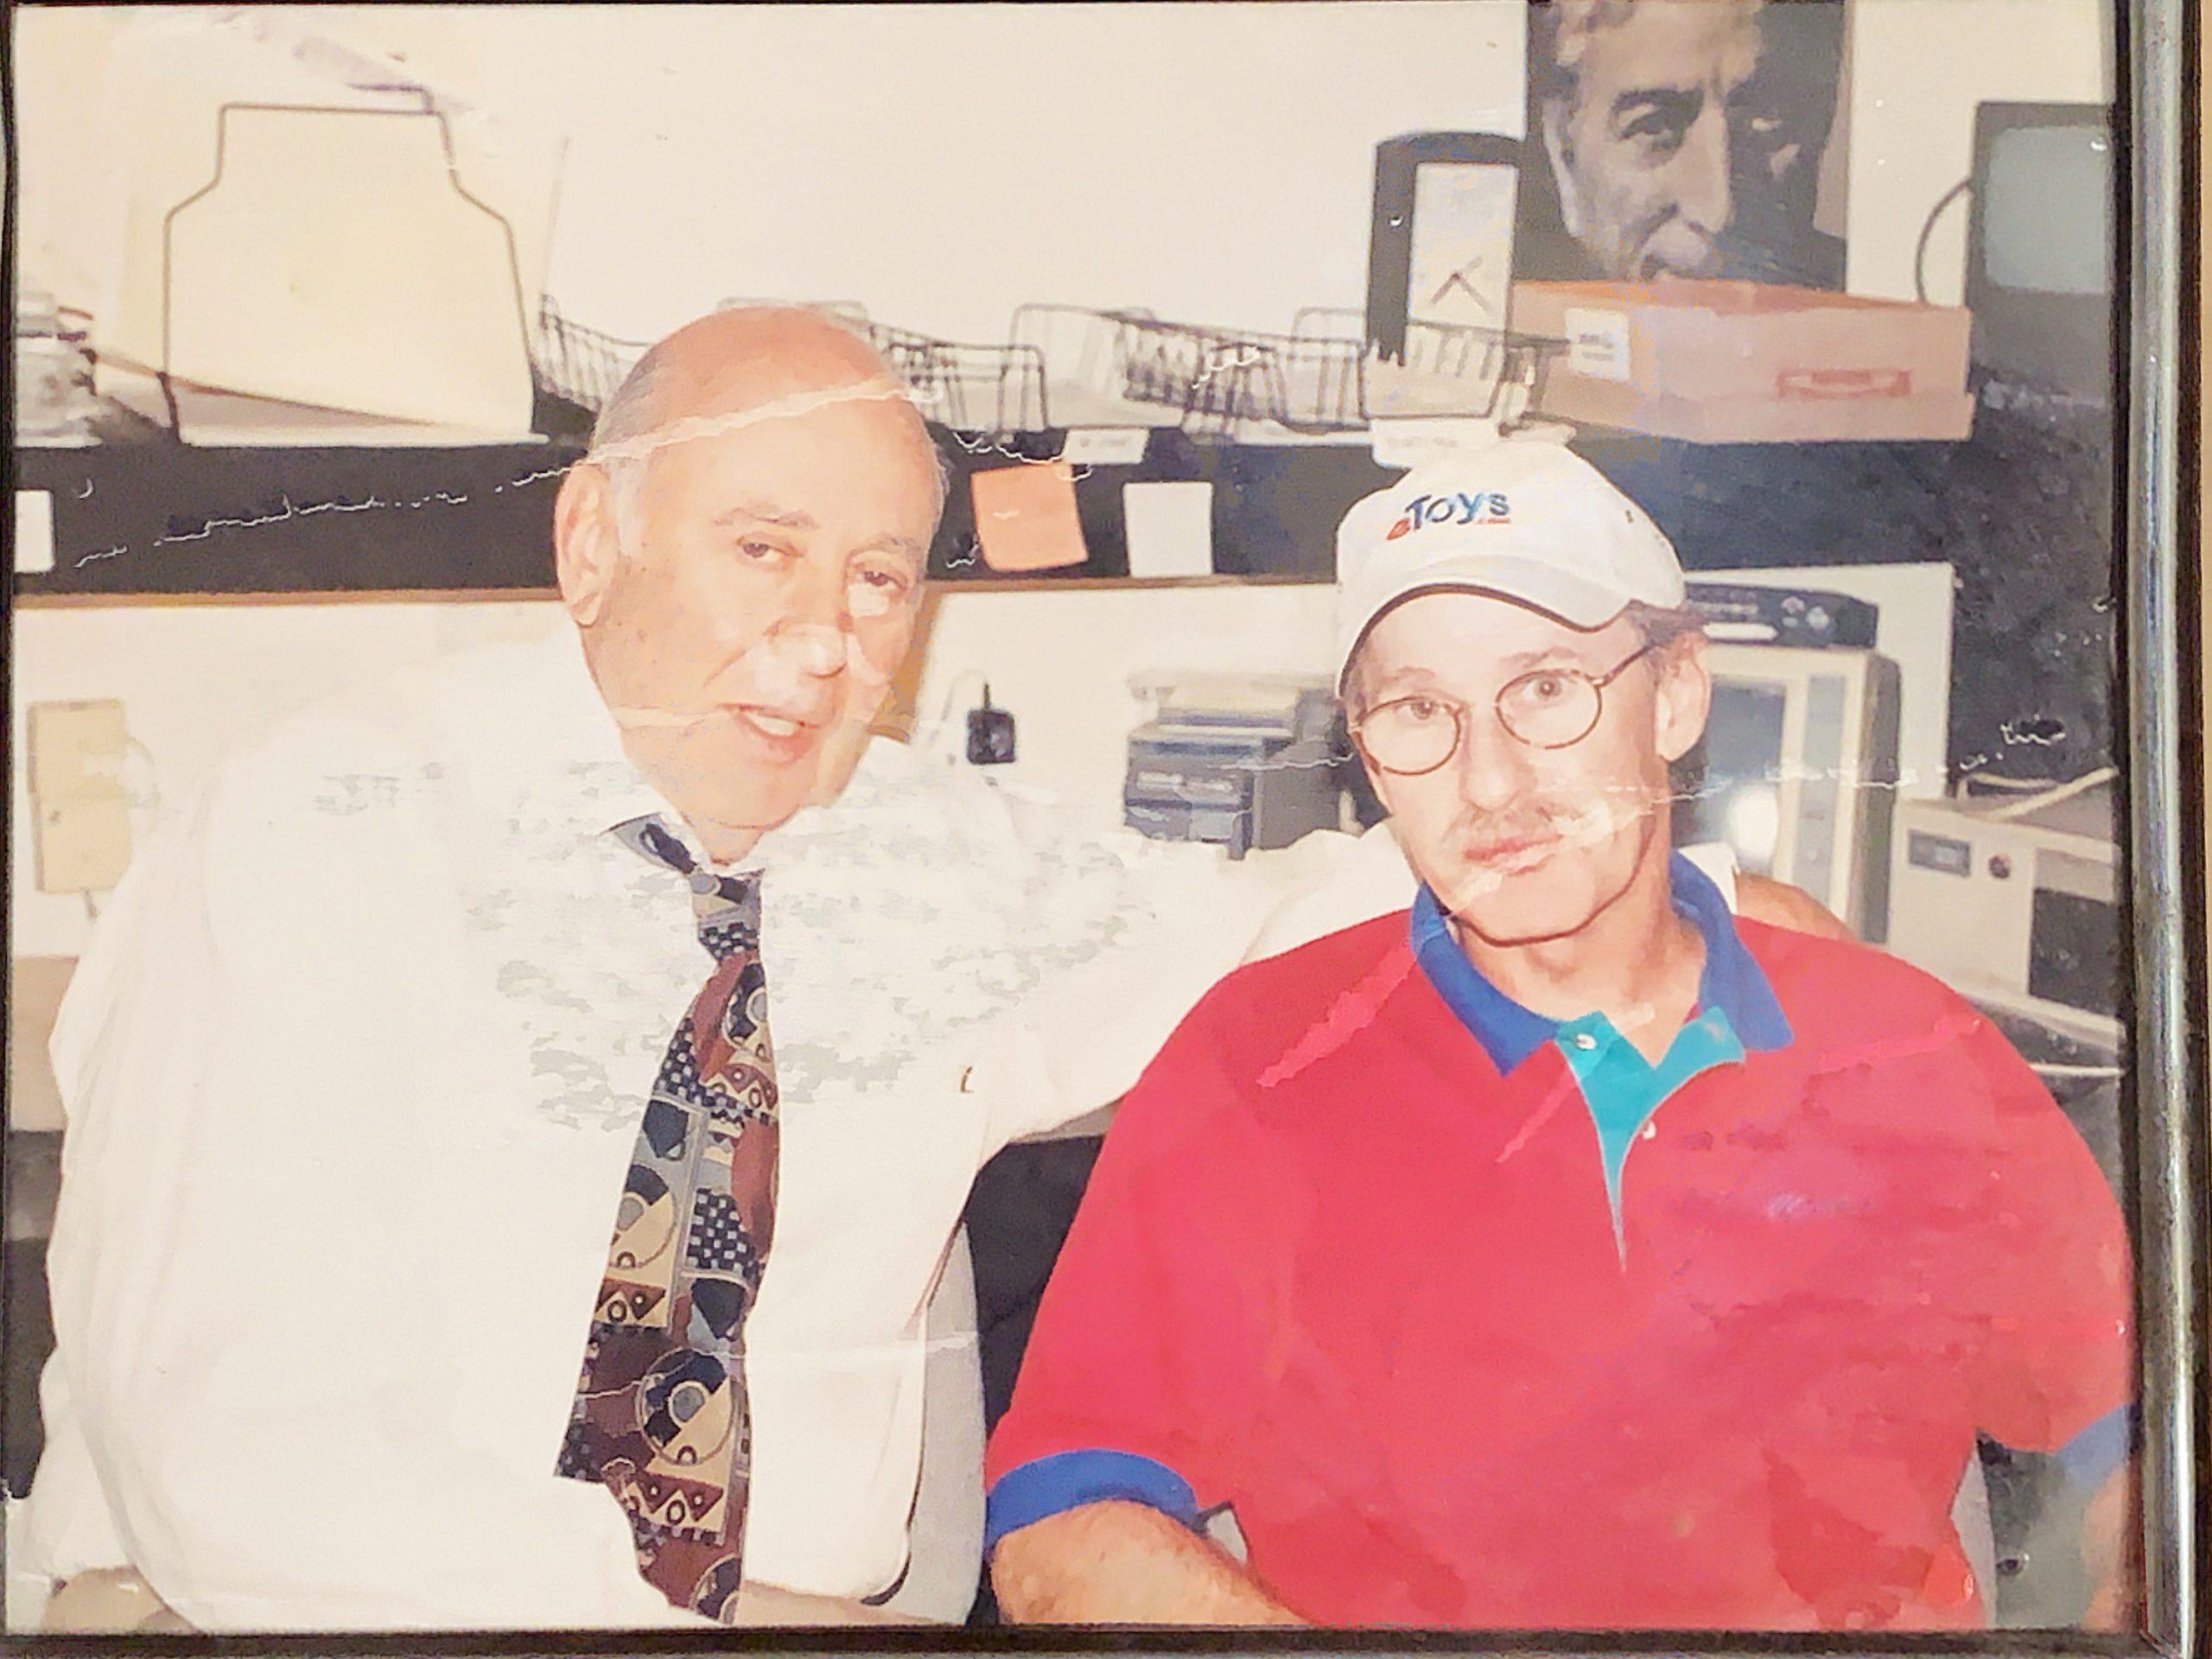 Carl Reiner with Larry Davidson